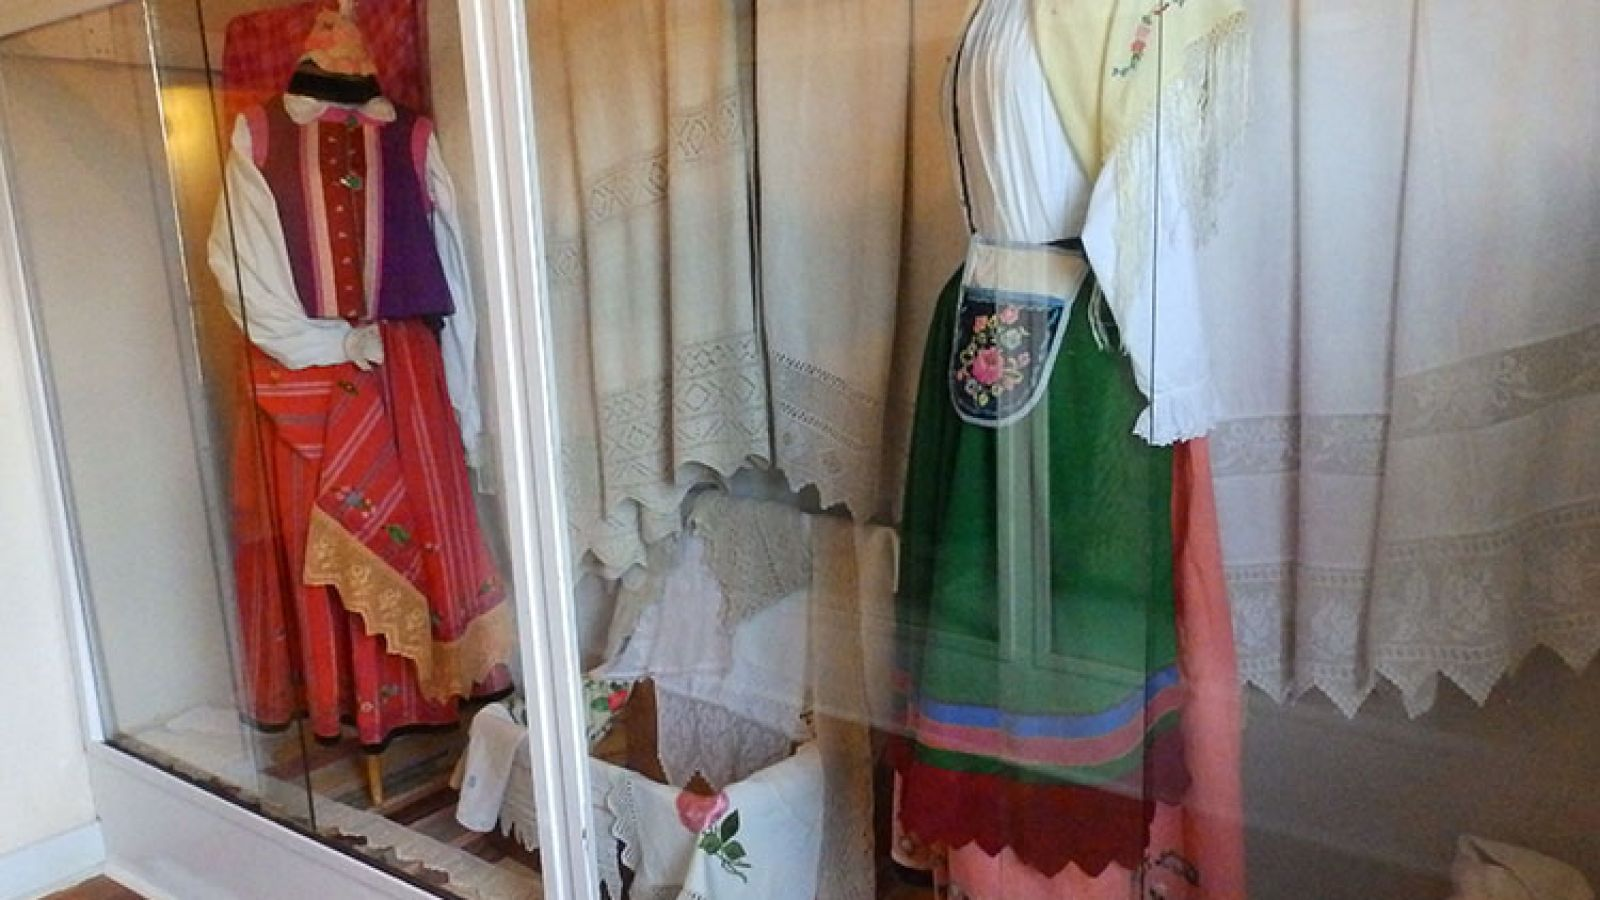 Textiles display.